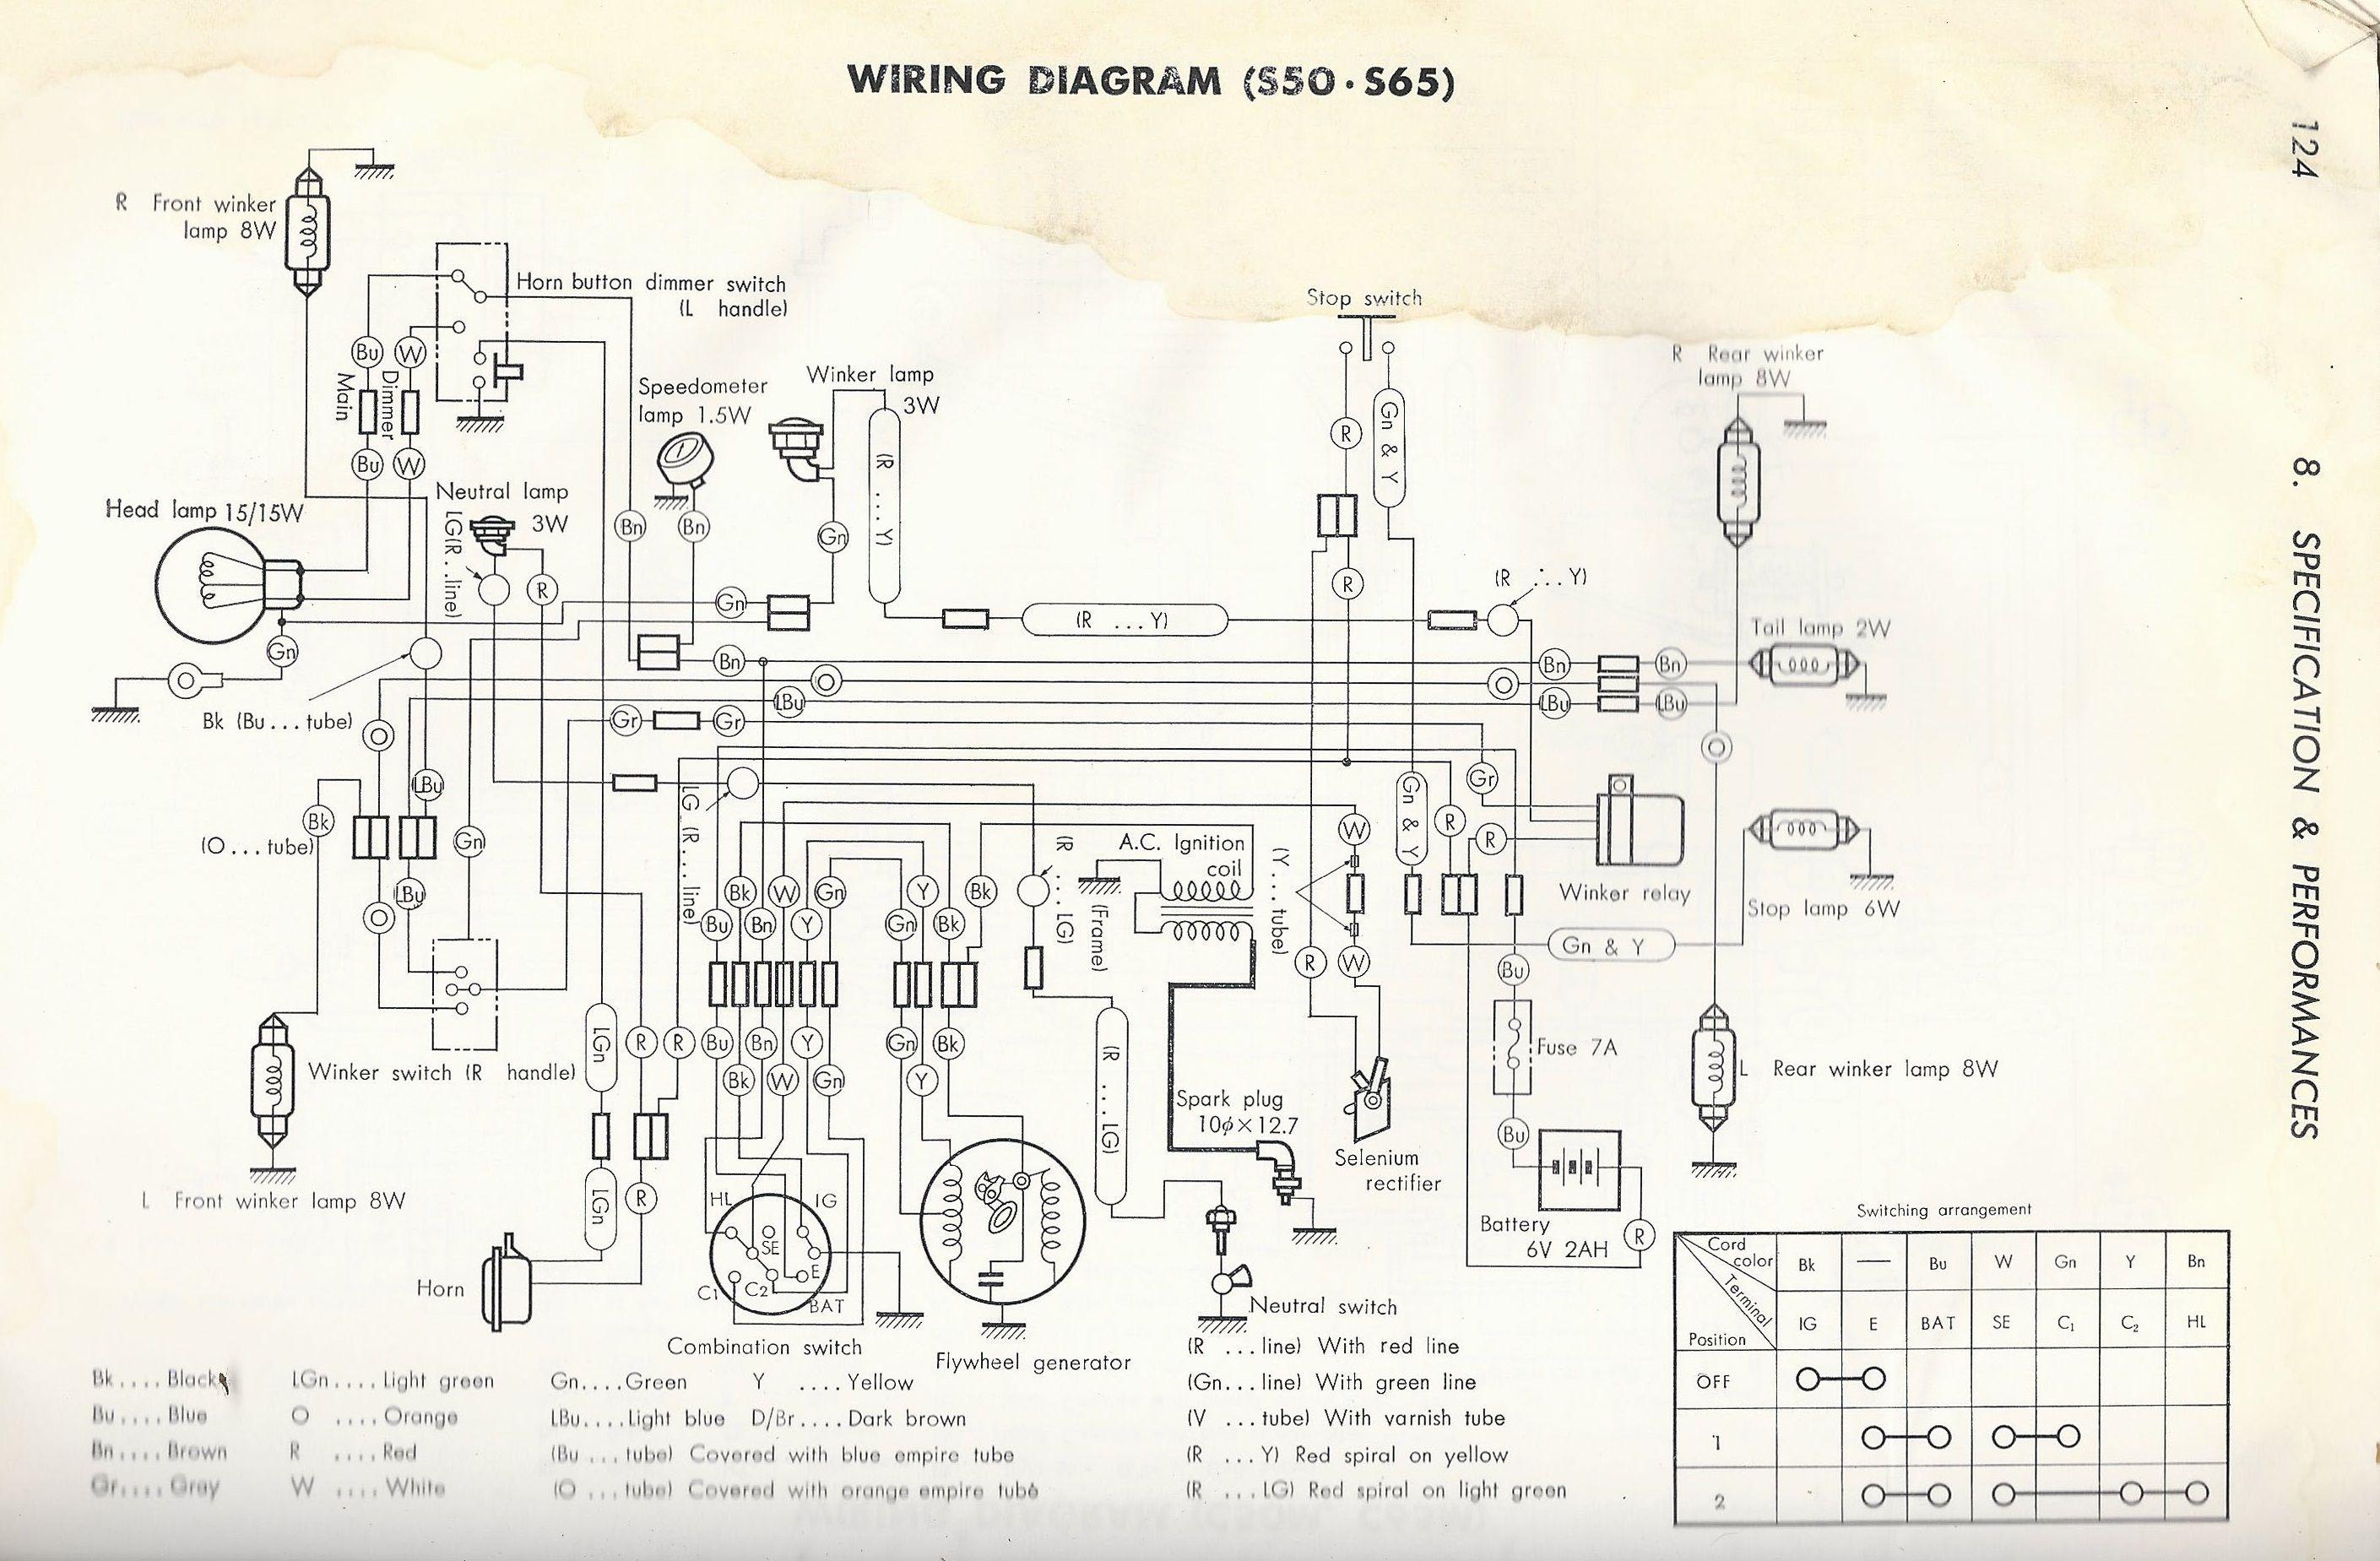 Honda S50 Circuit Wiring Diagram 2 Diagram Wire Circuit